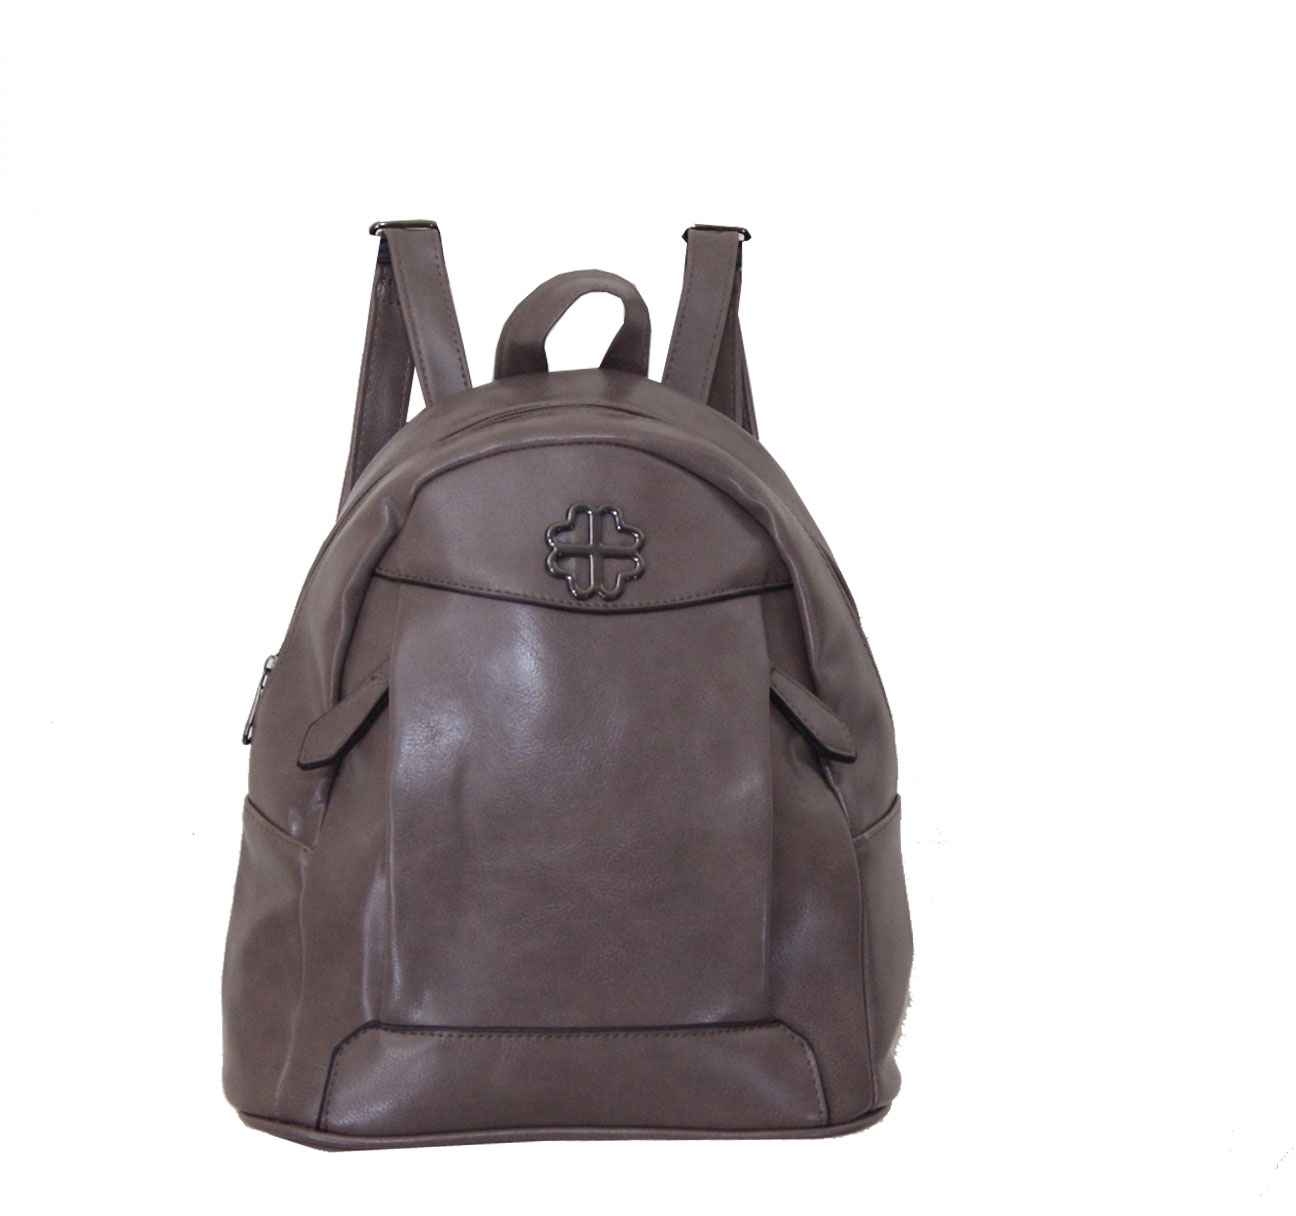 Backpack No 664 - Γκριζοκαφέ (Silvio 664)